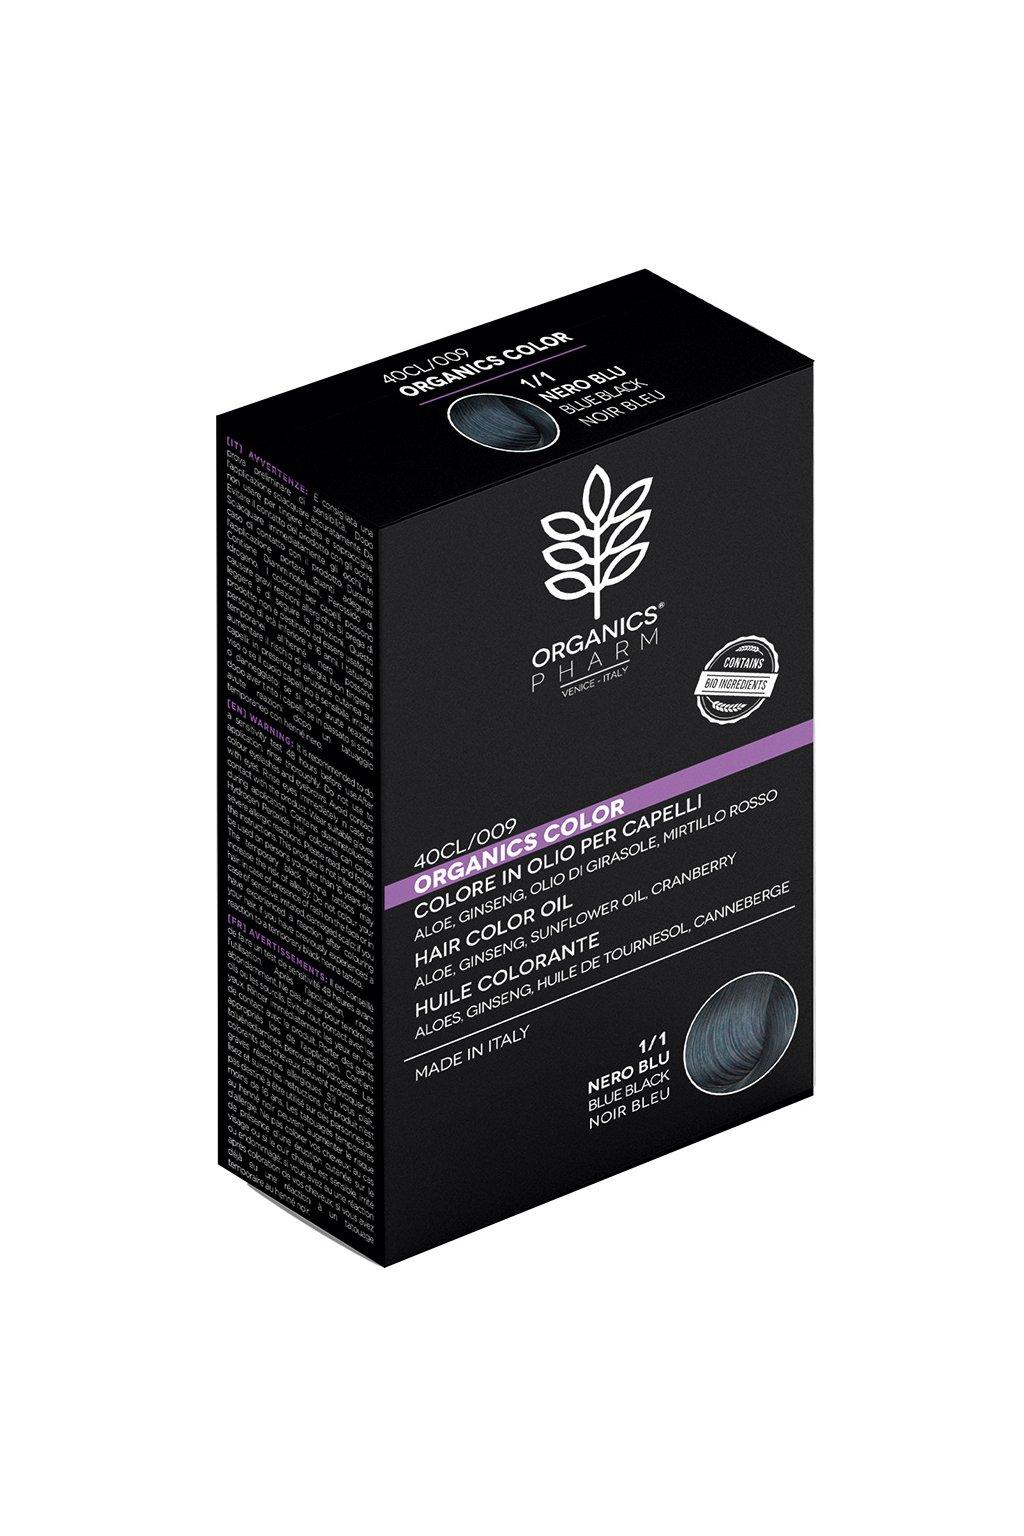 ORGANICS PHARM Organics Color Hair Color Oil 122ml 1 1 Blue Black